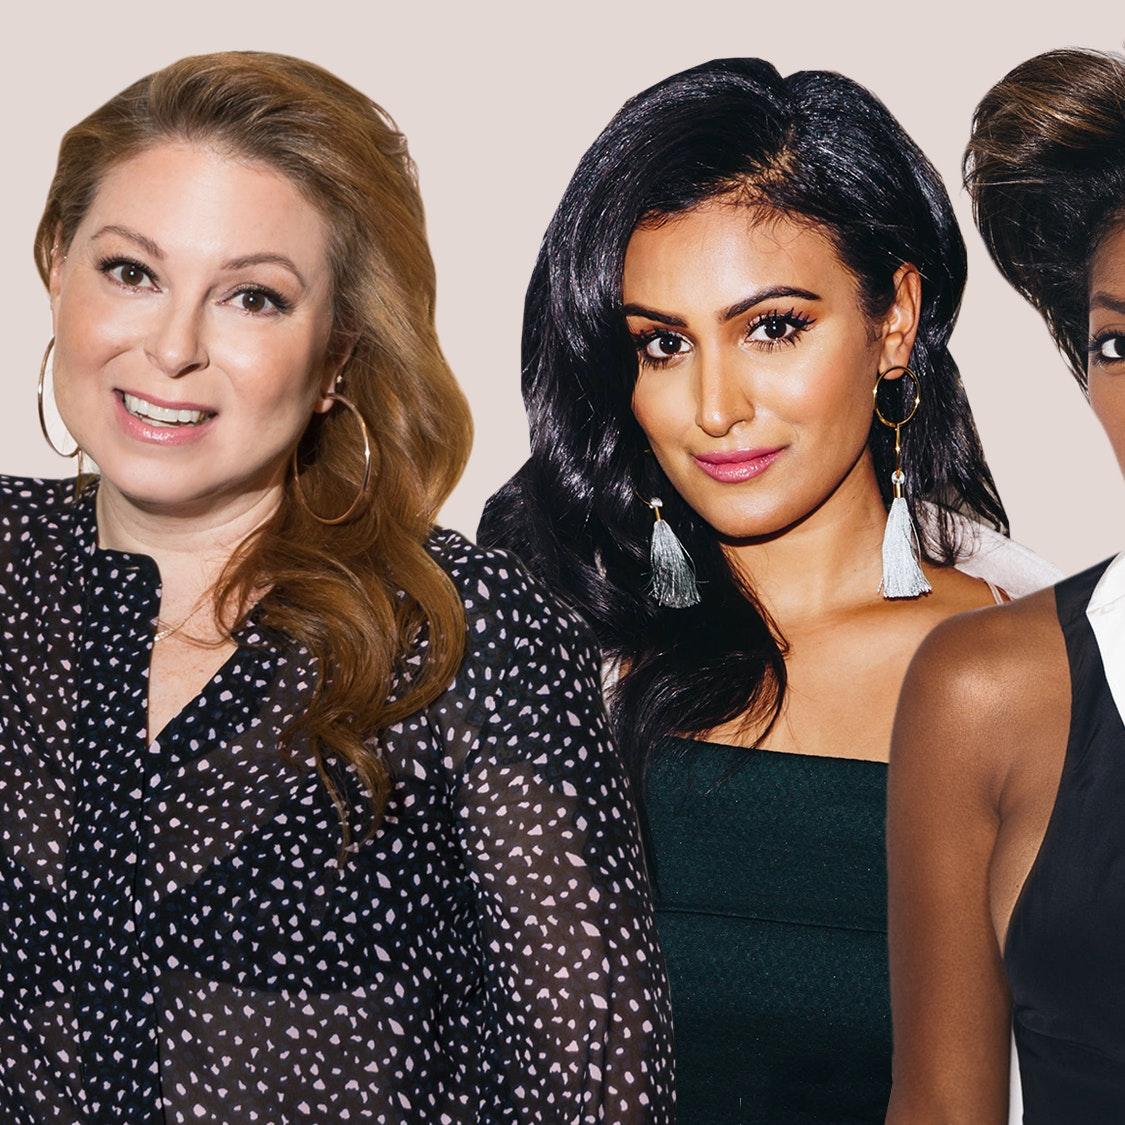 16 Inspiring Women That'll Get You In the International Women's Day Spirit